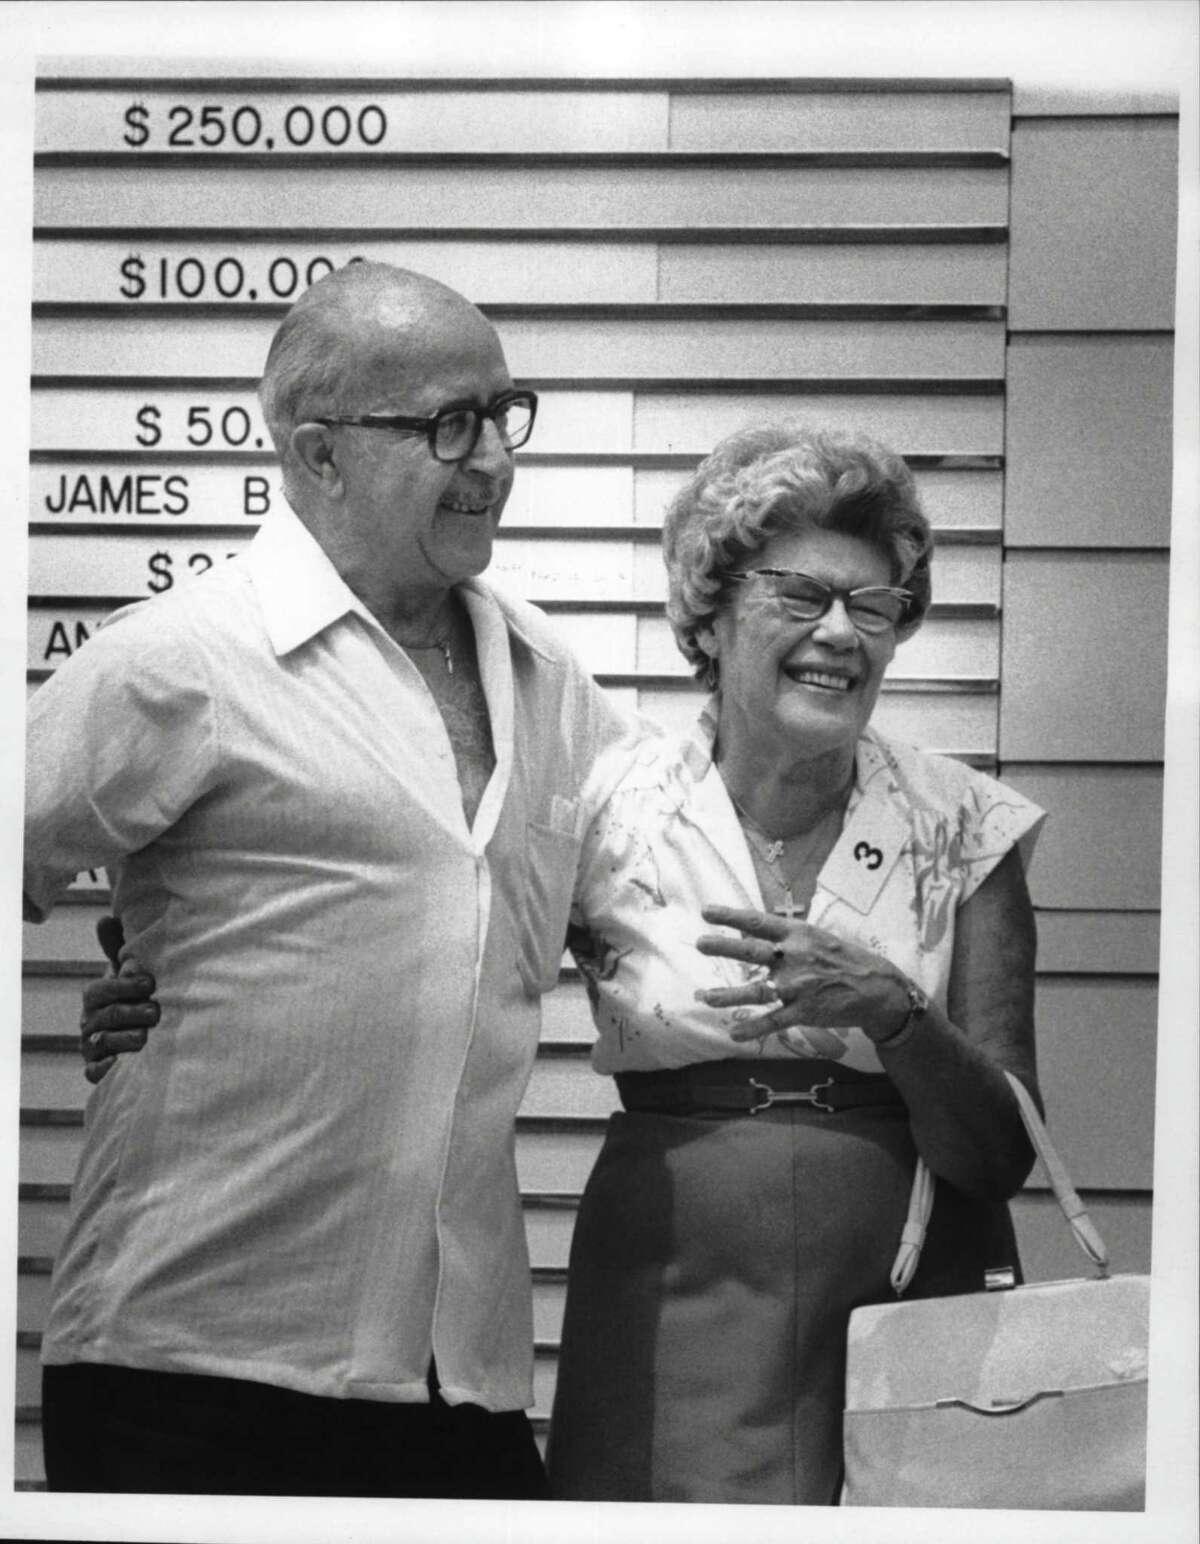 Jess & Marie Prokosch, $250,000 New York lottery winners, at Capitol Park. June 26, 1980 (Raymond B. Summers/Times Union Archive)